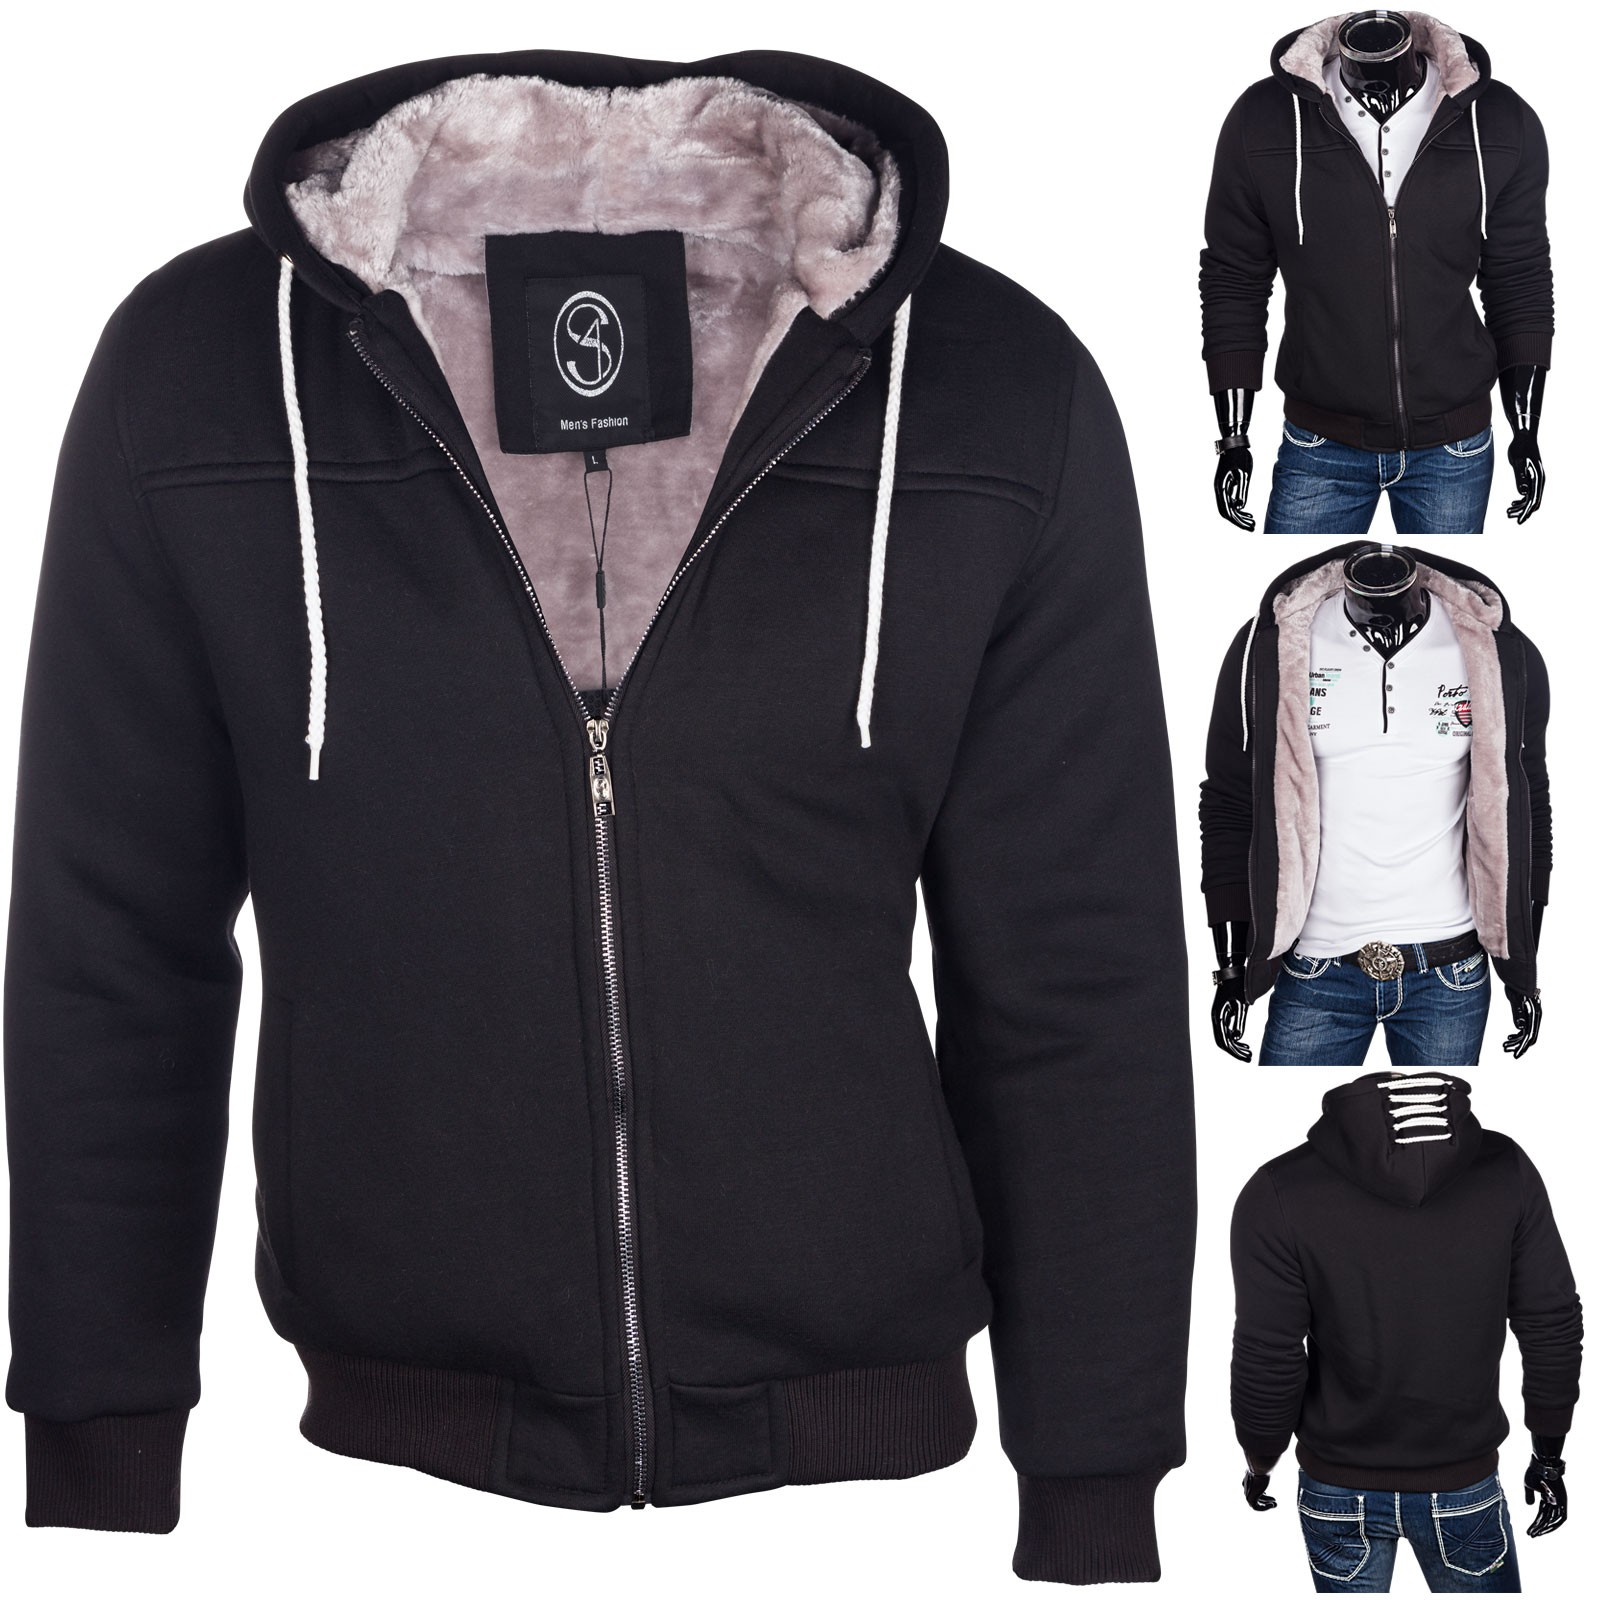 herren jacke winterjacke warm bergangsjacke jacke hoodie gef ttert herren mode kapuzenpullover. Black Bedroom Furniture Sets. Home Design Ideas